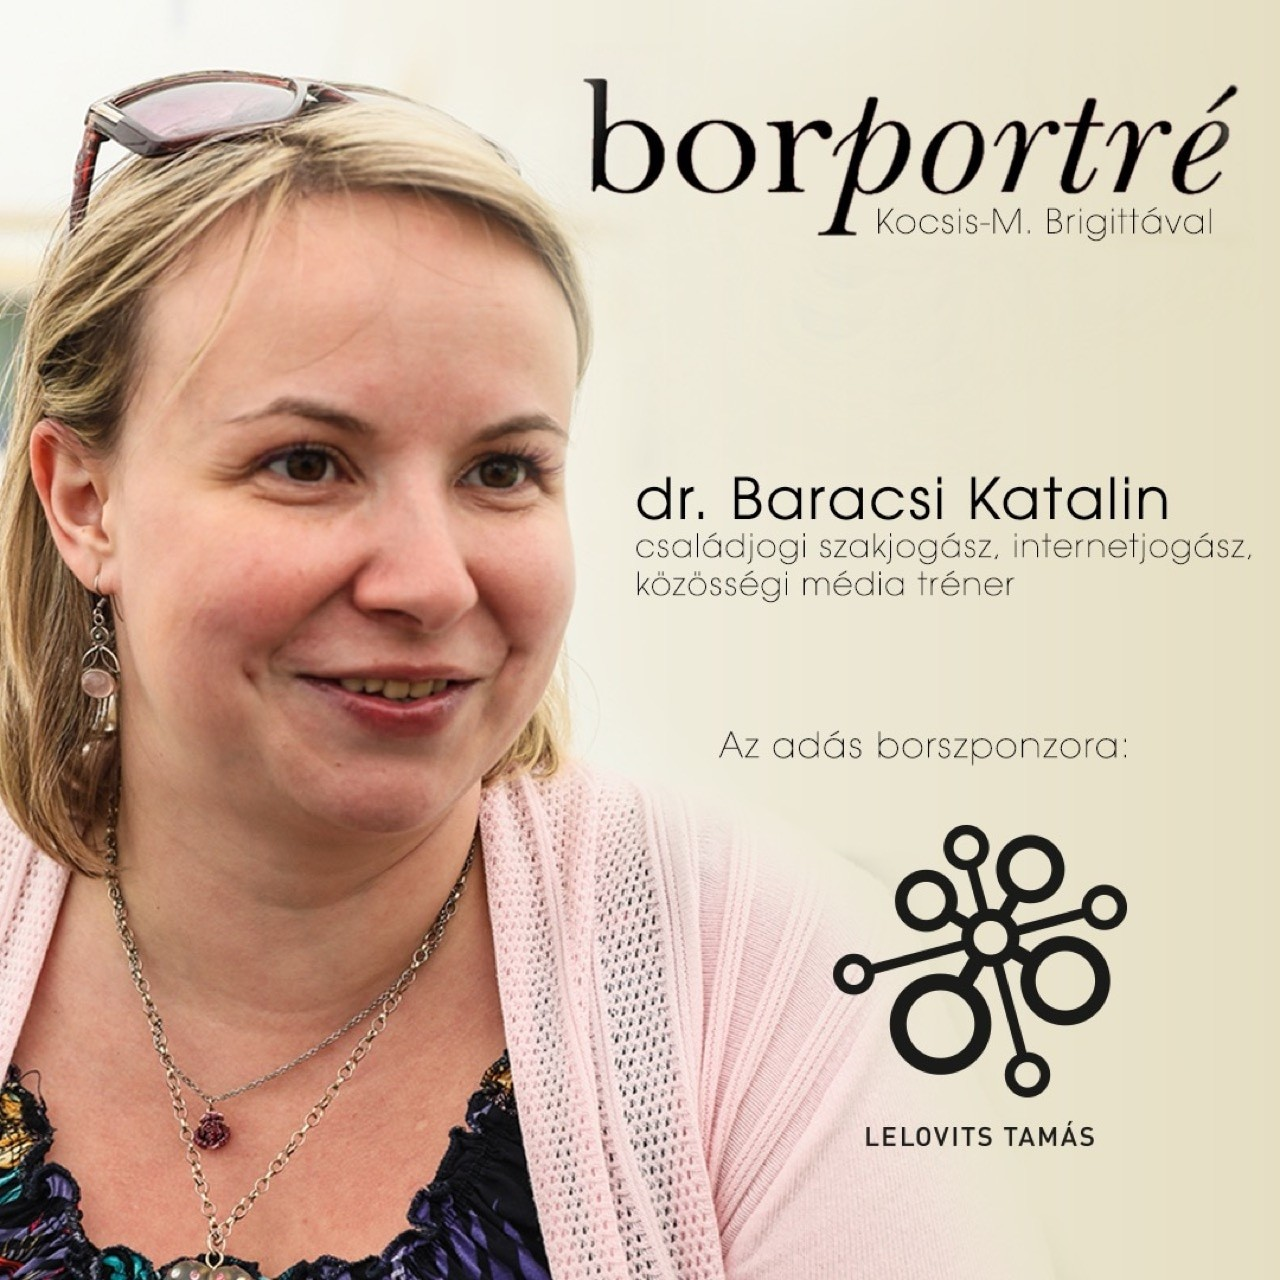 borportre_2021_02_10_dr_baracsi_katalin_nethasznalat_lelovits_kocka